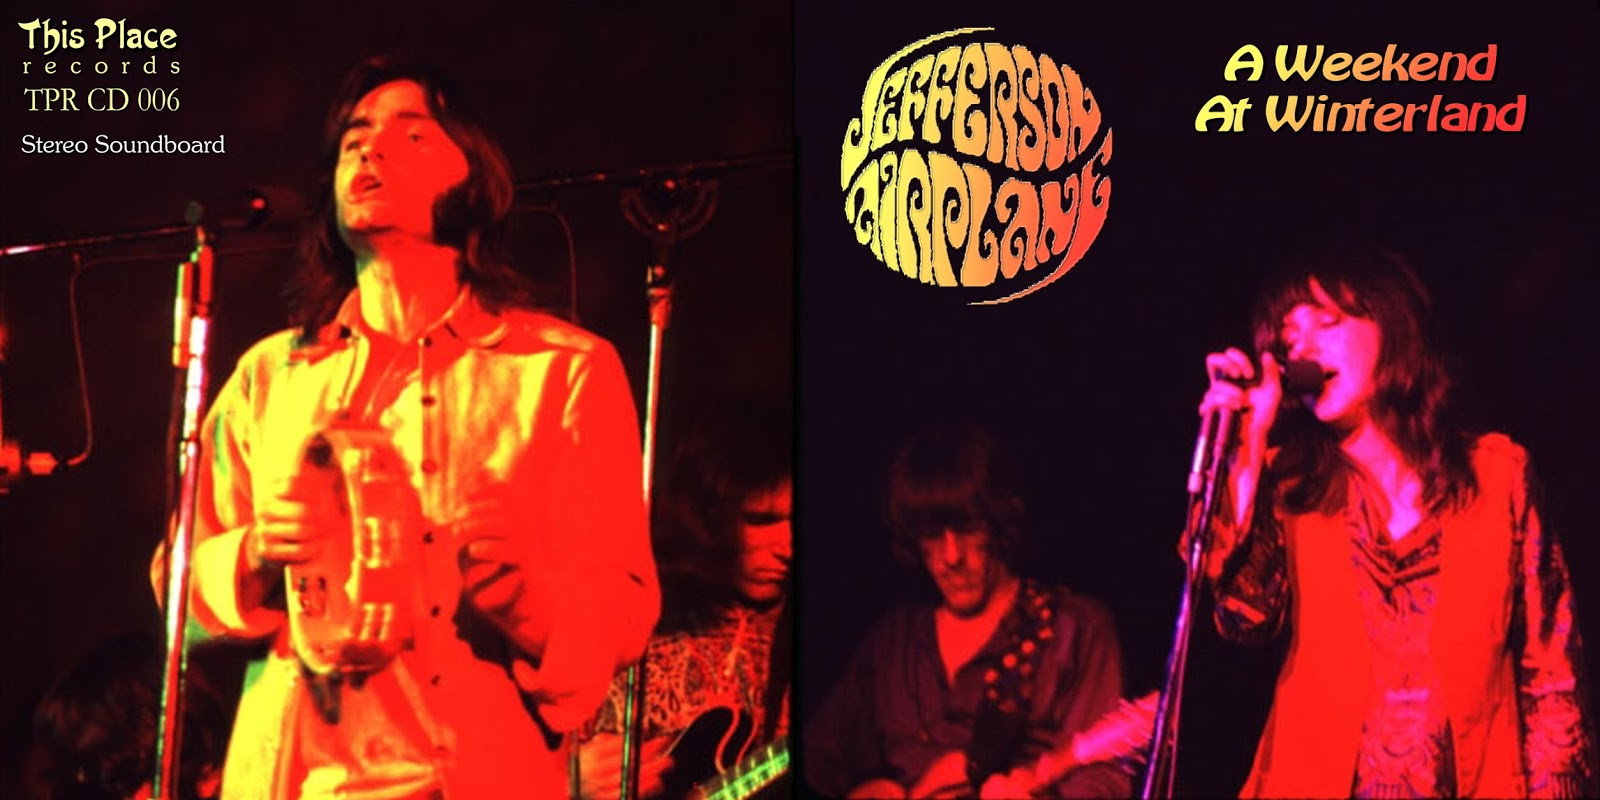 T U B E : Jefferson Airplane - 1969-10-25/26 - San Francisco, CA